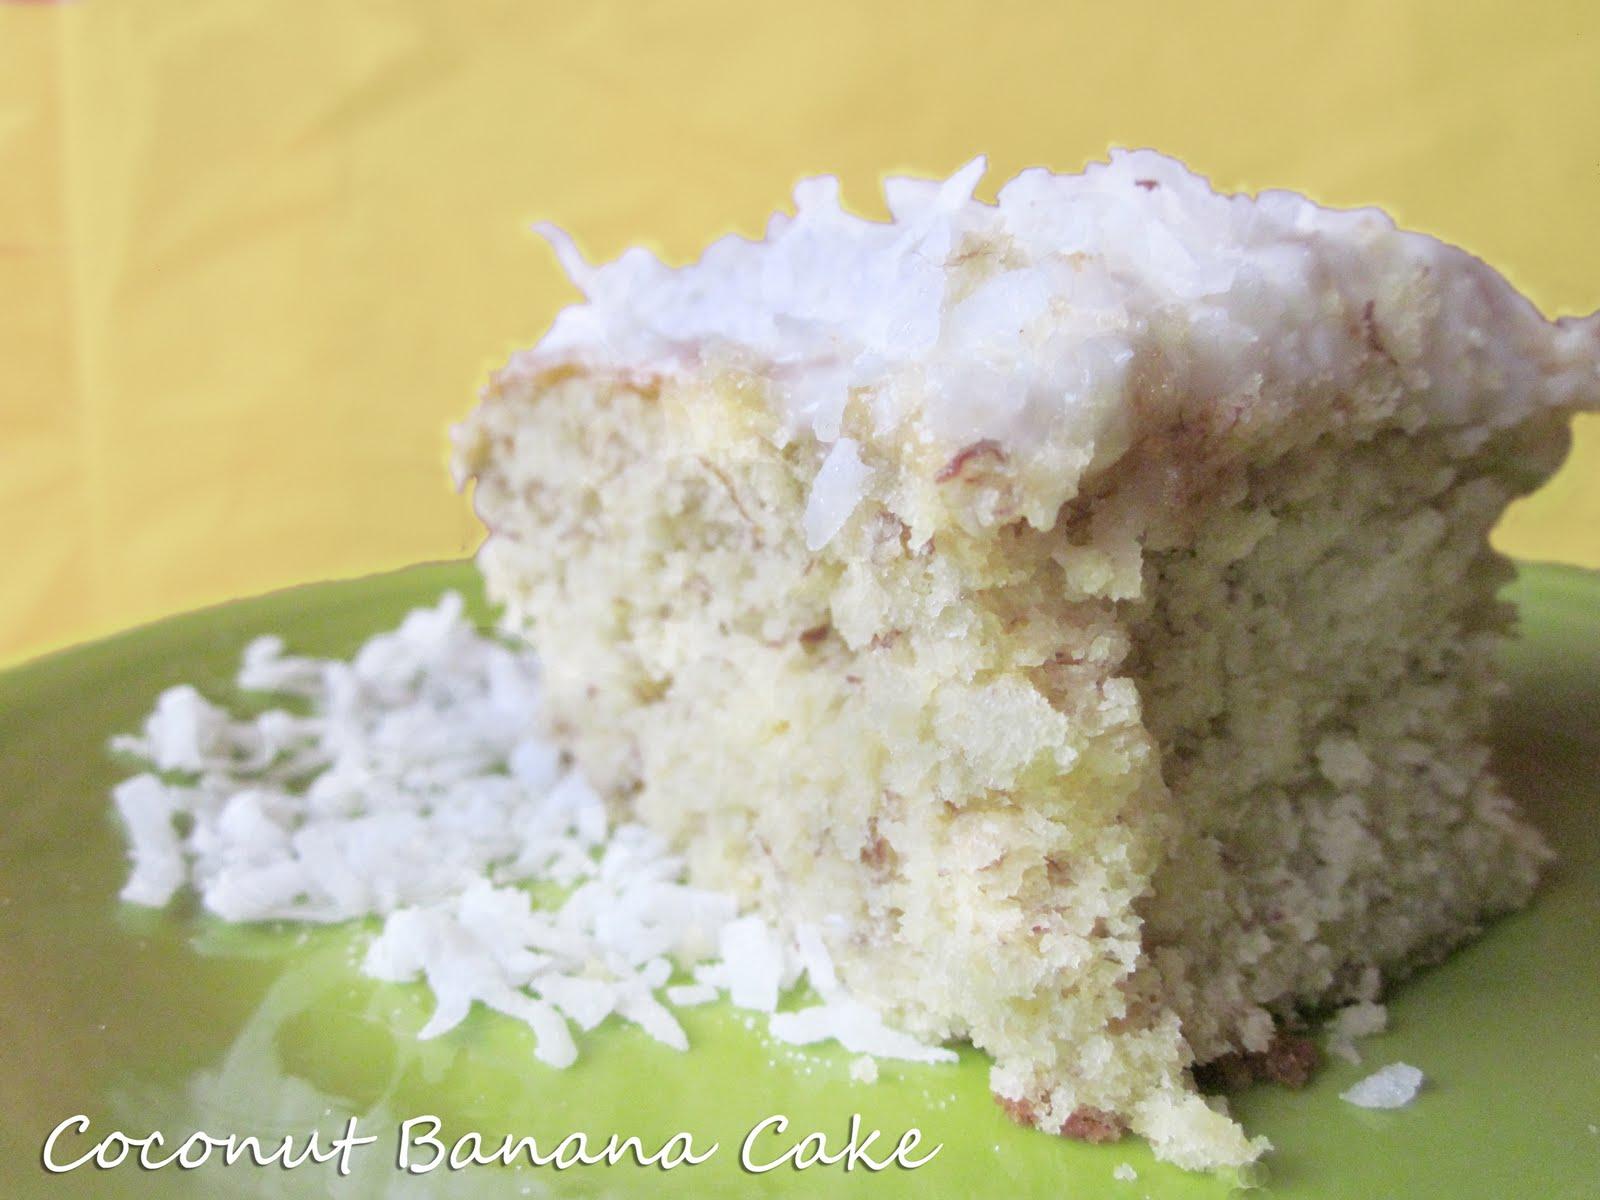 Banana-Coconut-Sesame Cake Recipes — Dishmaps